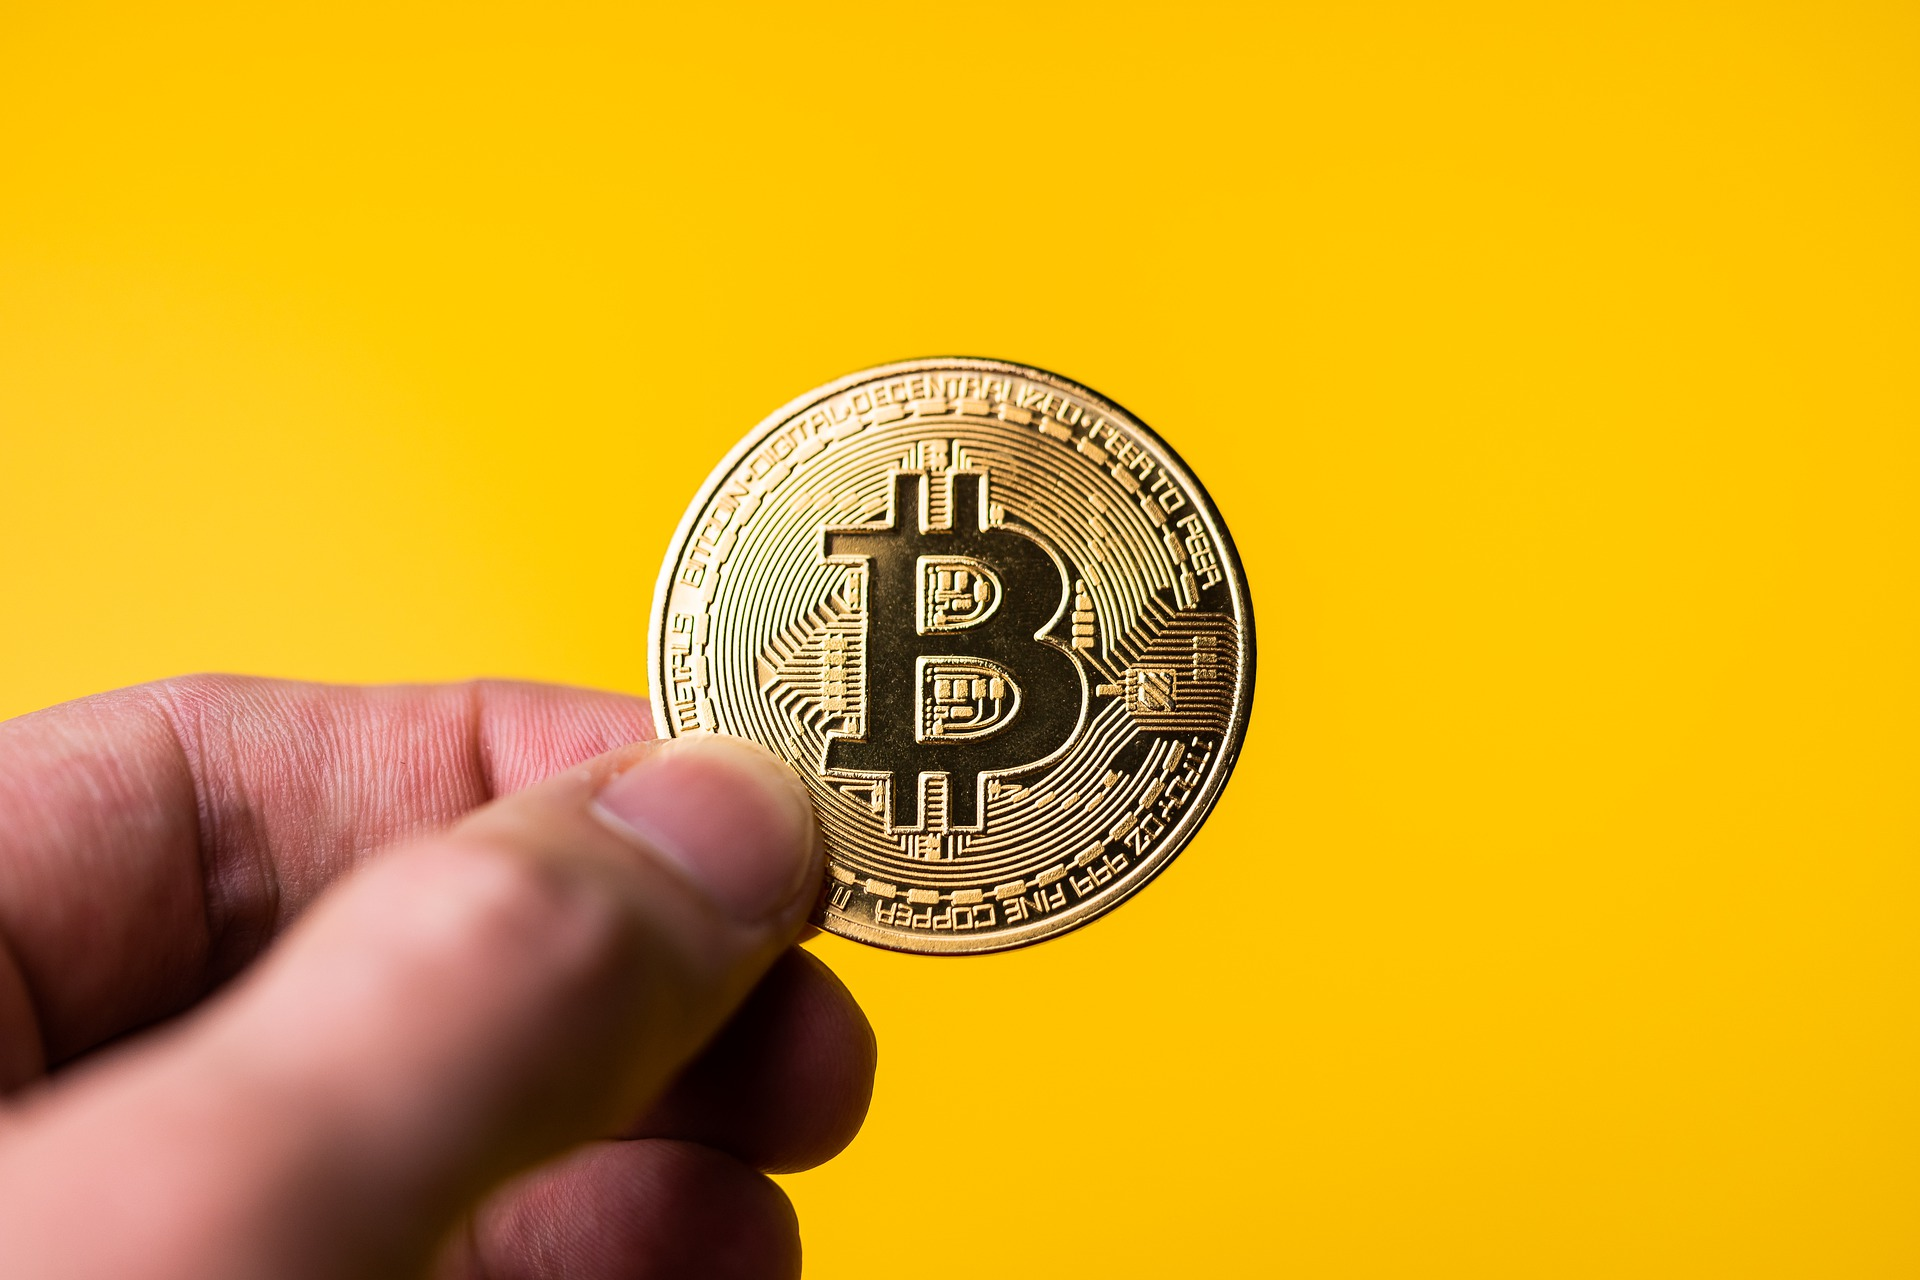 30,000 Bitcoin Move from a Major Crypto Exchange into Thin Air